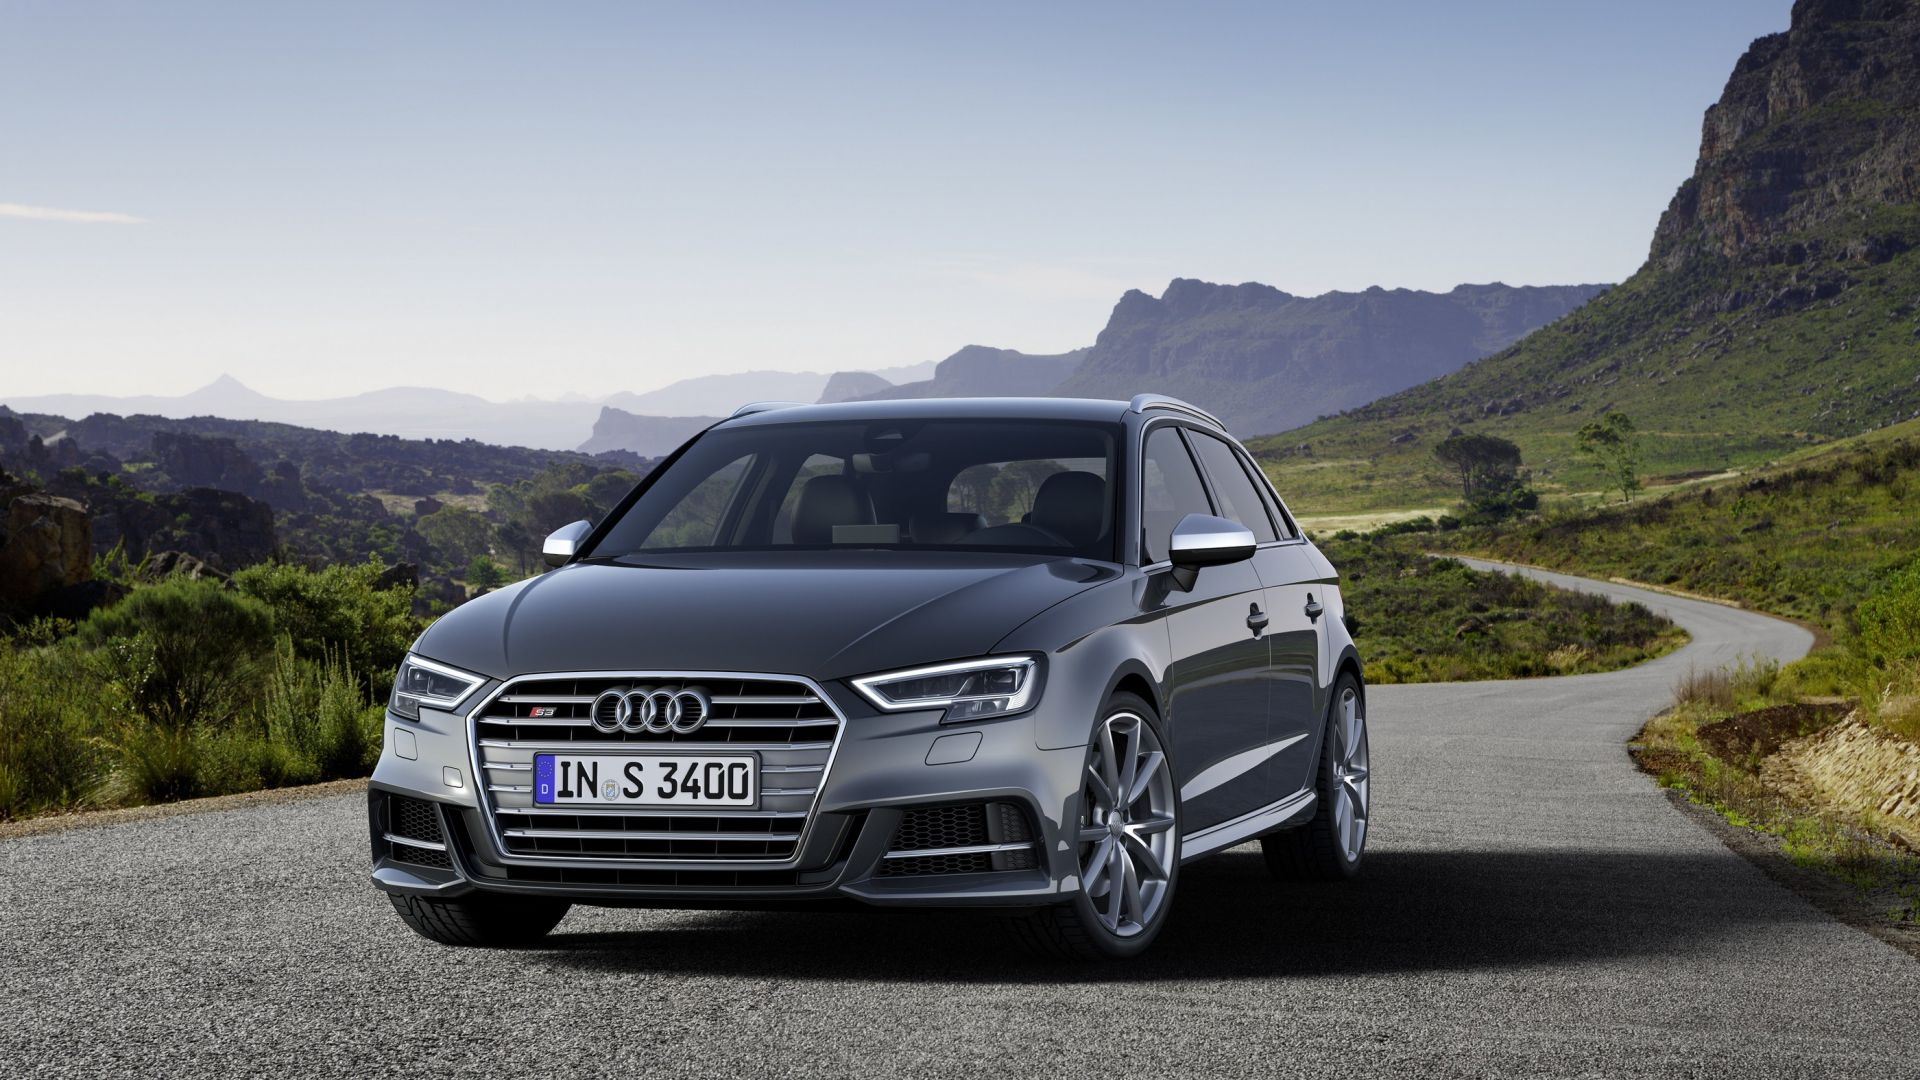 Novit auto audi a3 2016 tutte le novit del restyling for Audi a3 restyling 2017